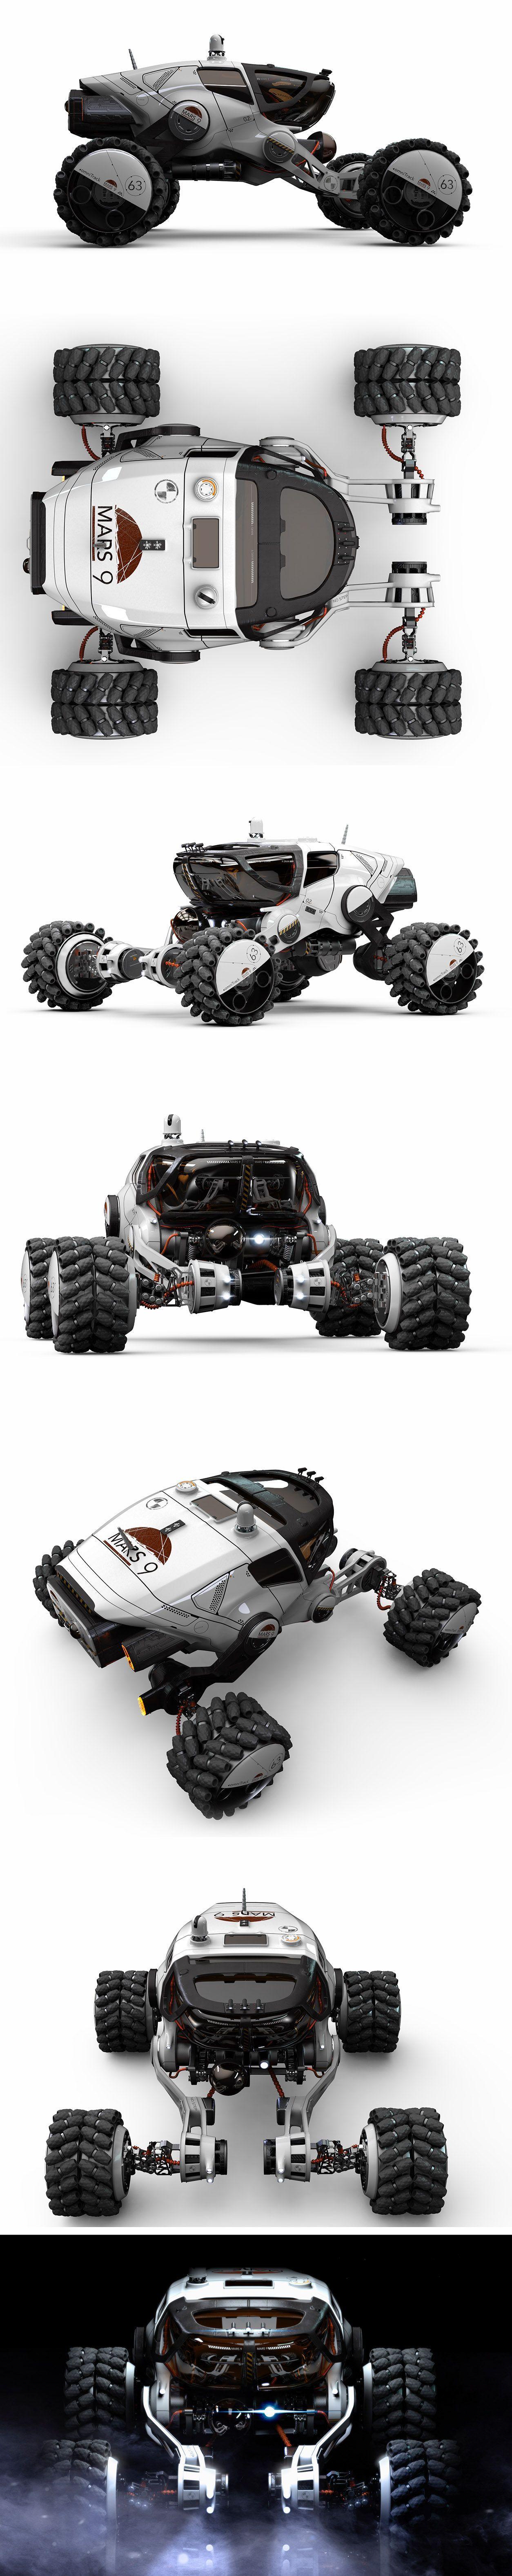 Mars 9 rover by Igor Sobolevsky (With images) Futuristic